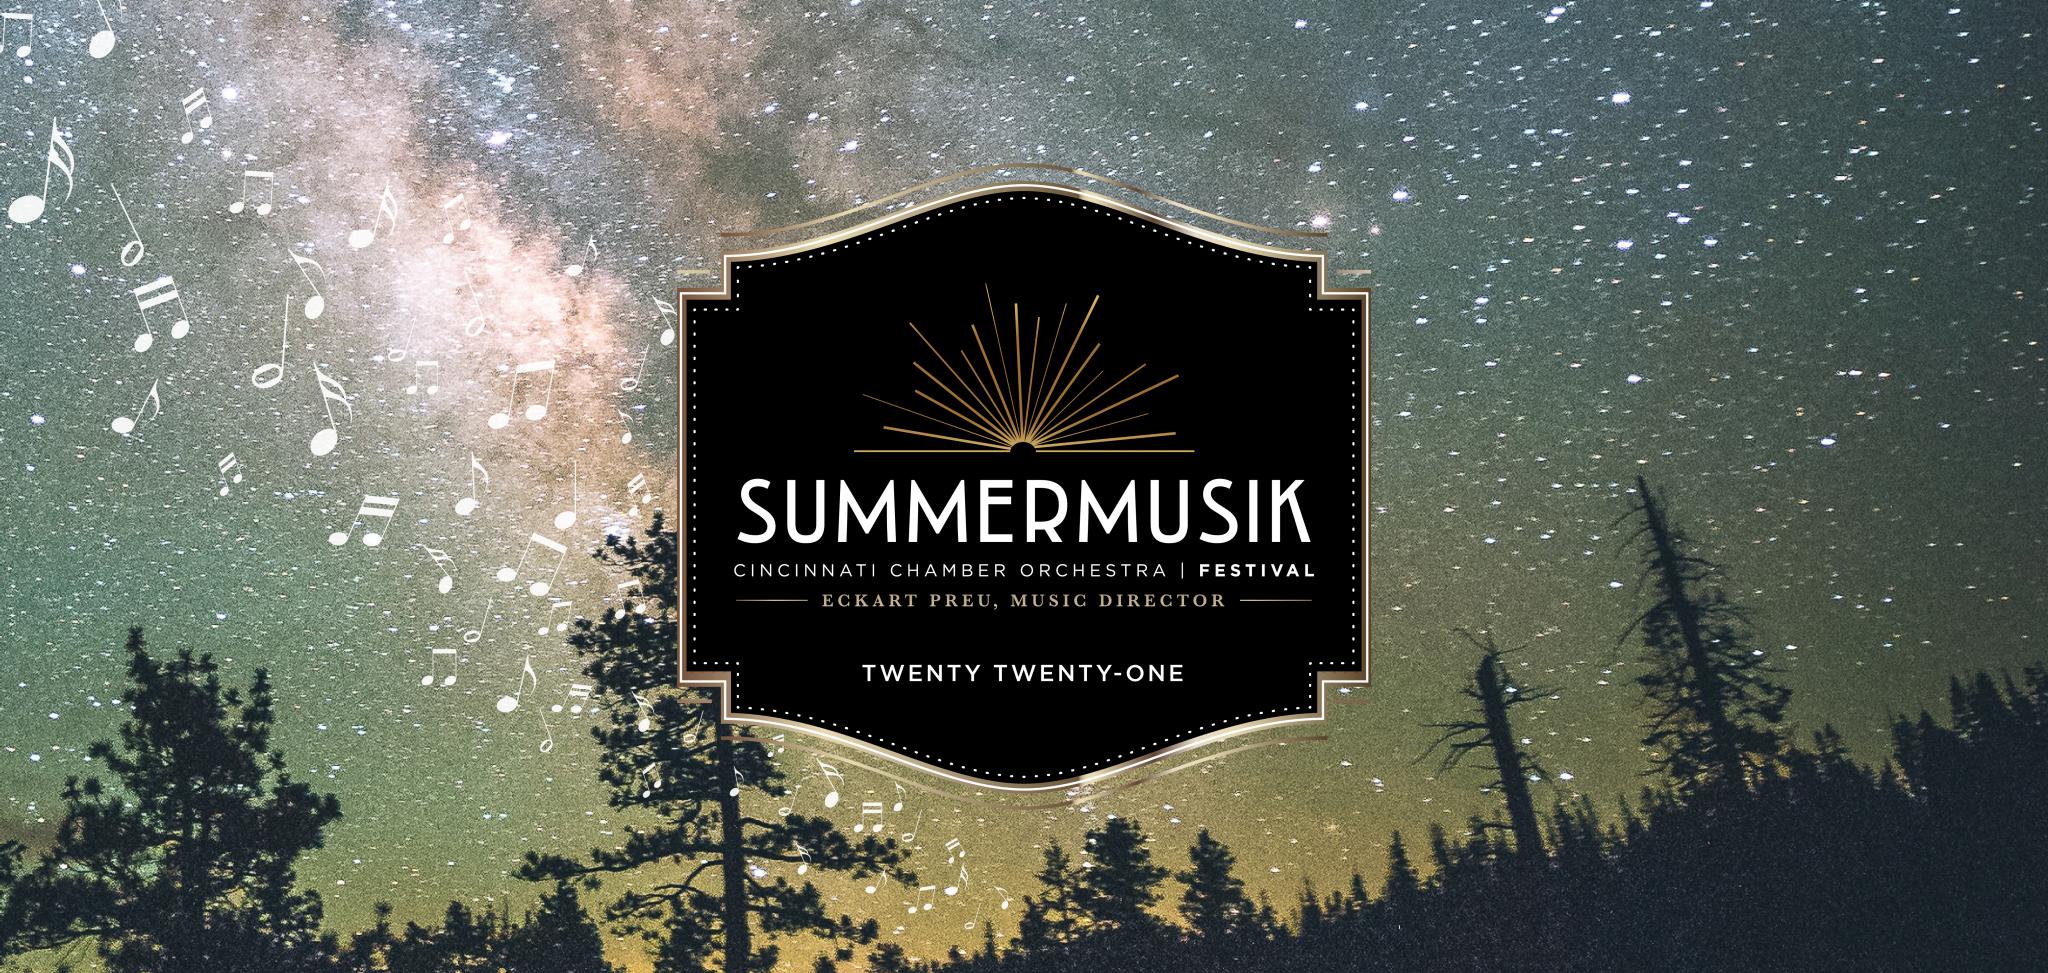 Summermusik